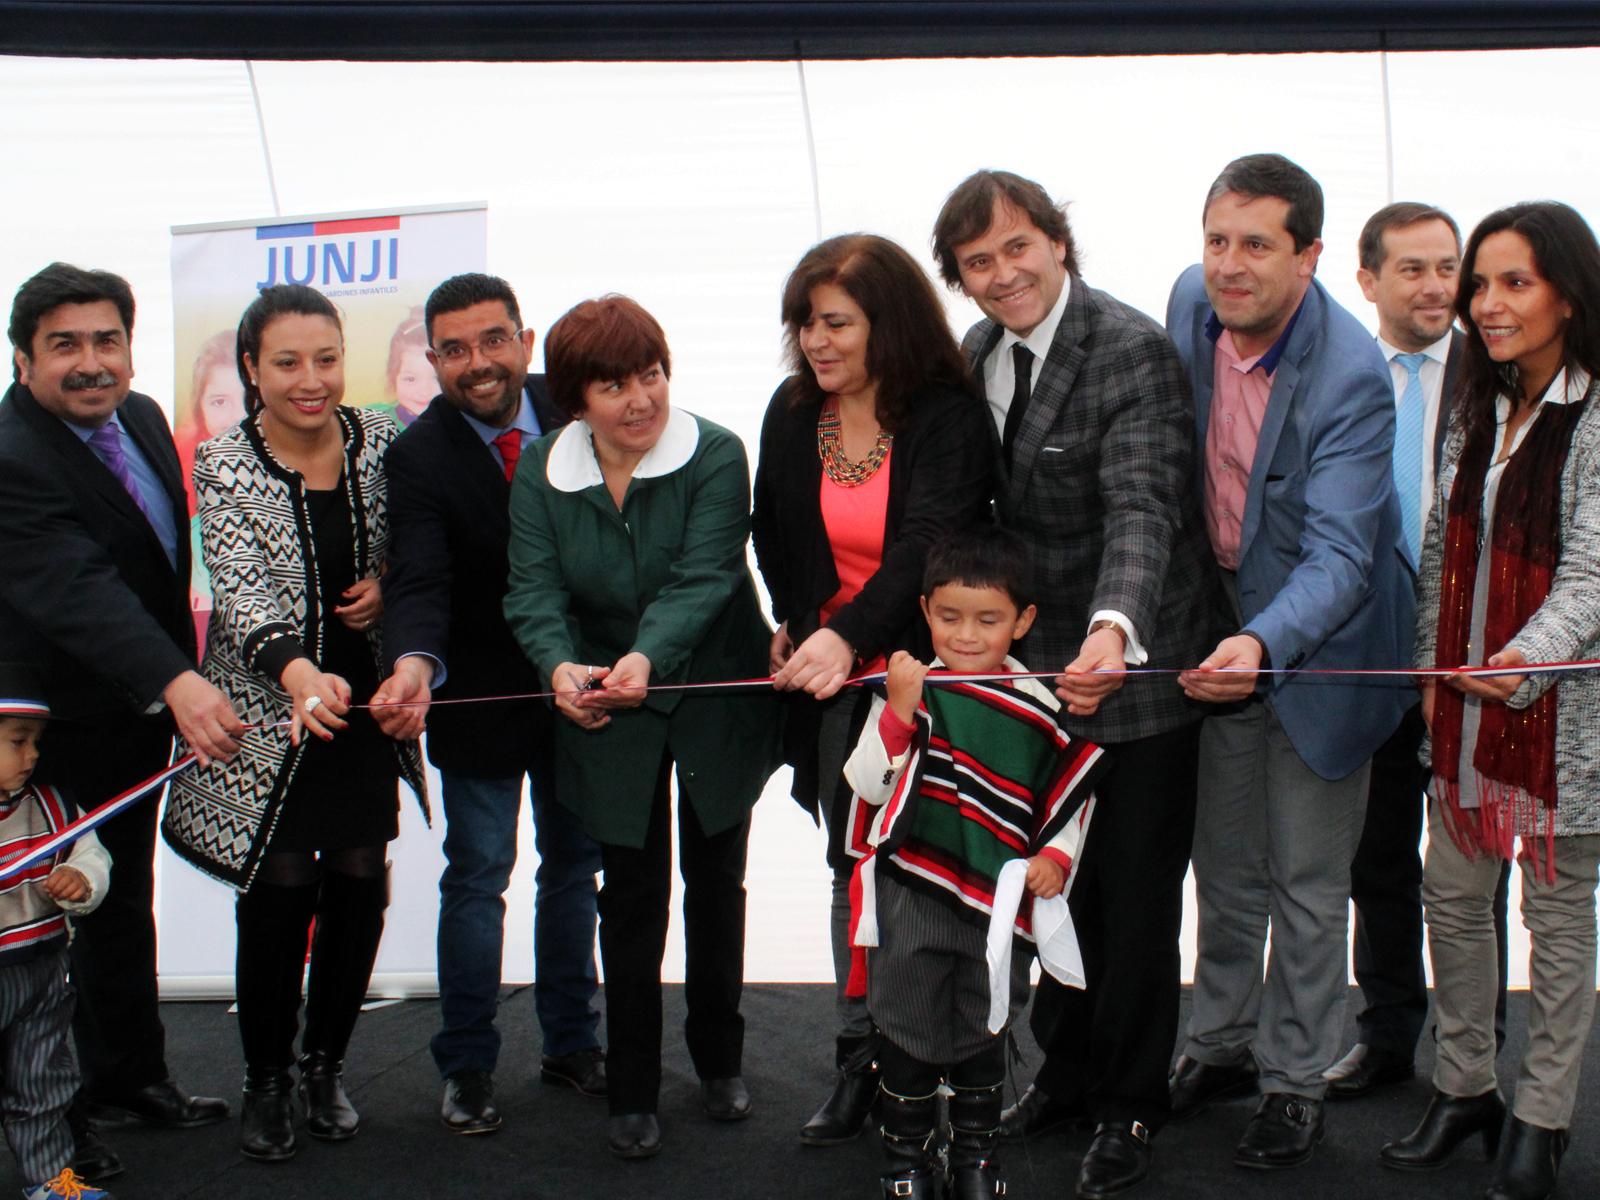 Junji inaugur jard n infantil creciendo entre poetas de for Postulacion jardin junji 2016